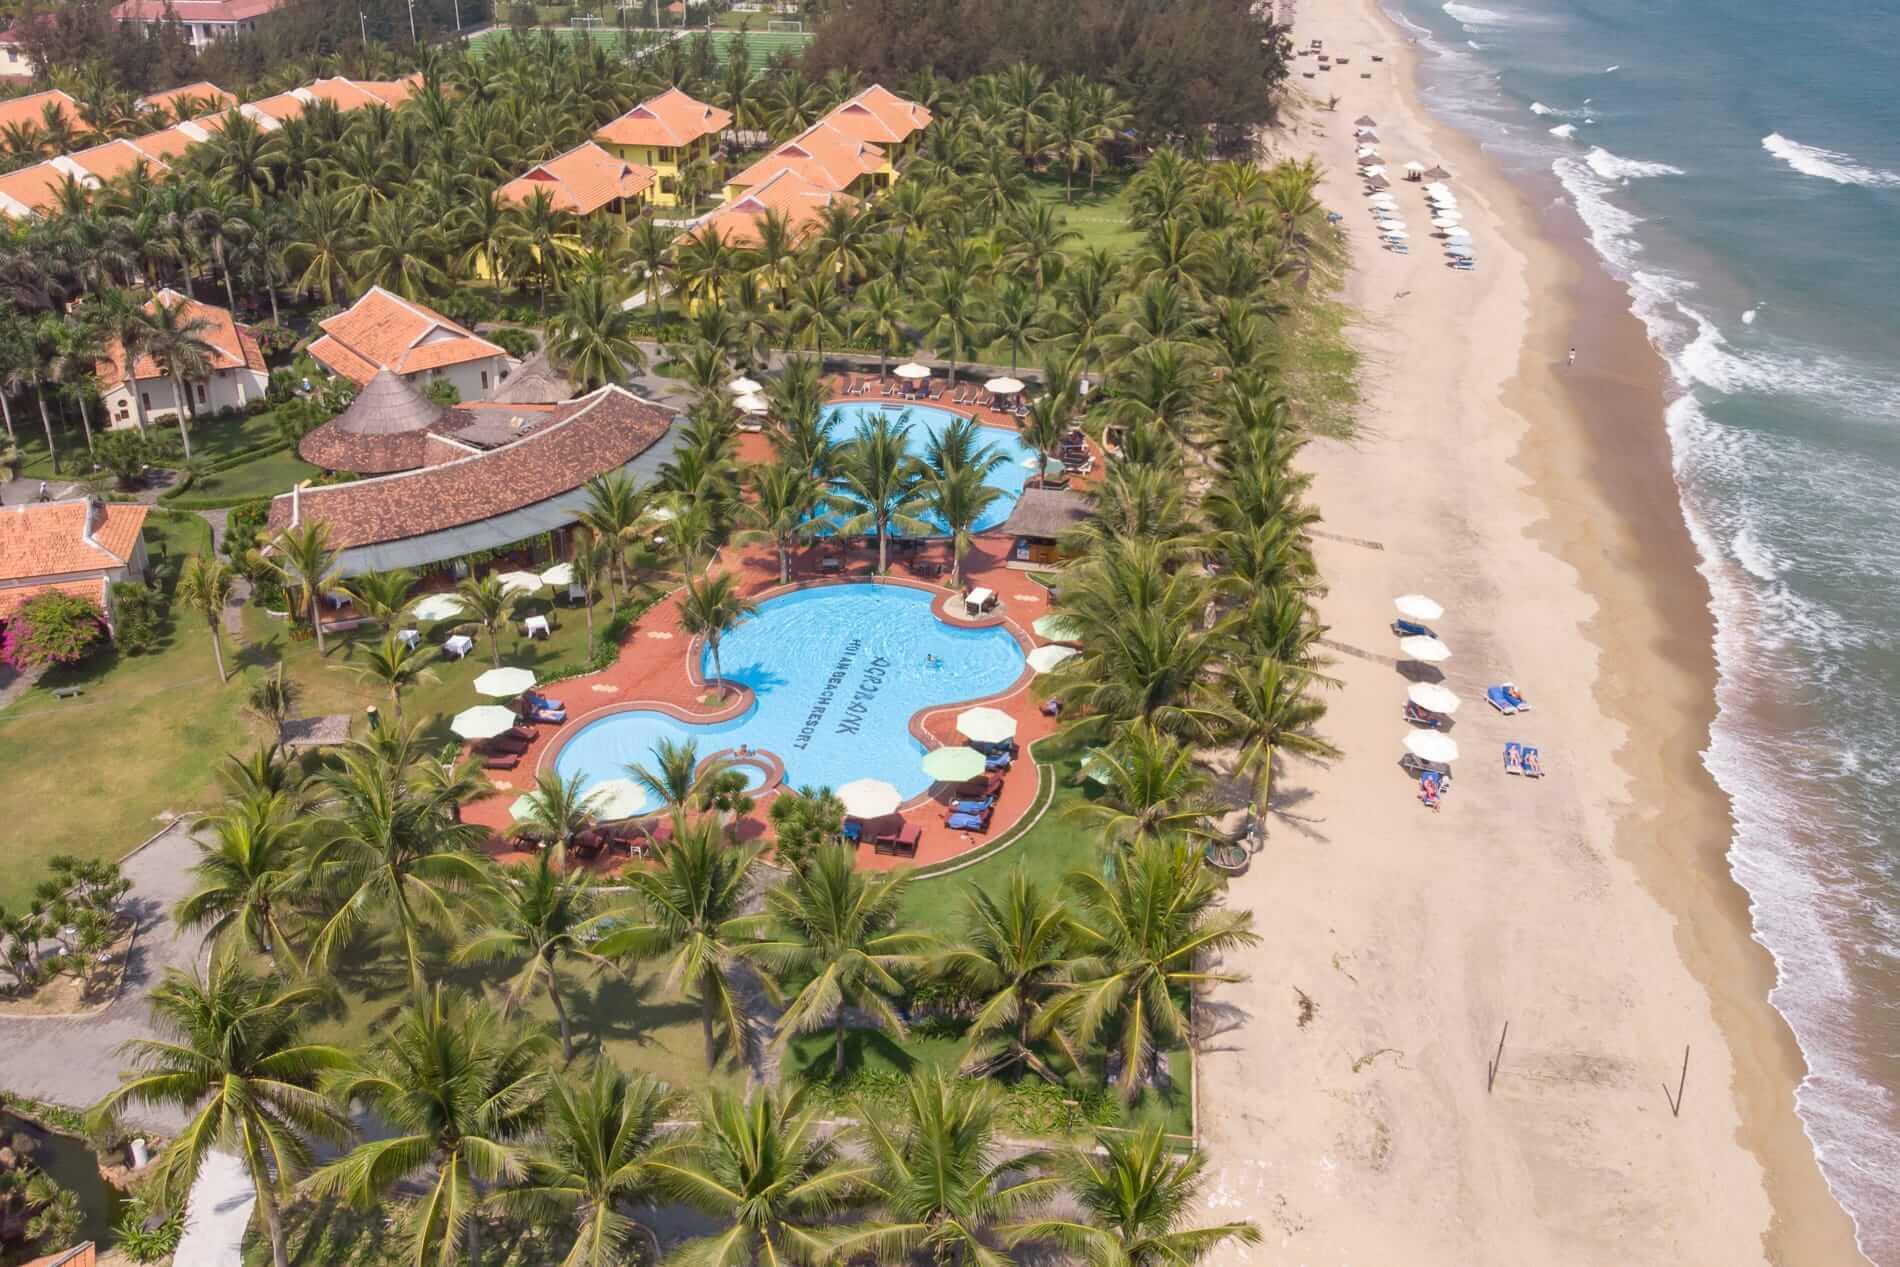 Beachside pool Tropical Beach Resort - Hoi An Beach Resorts